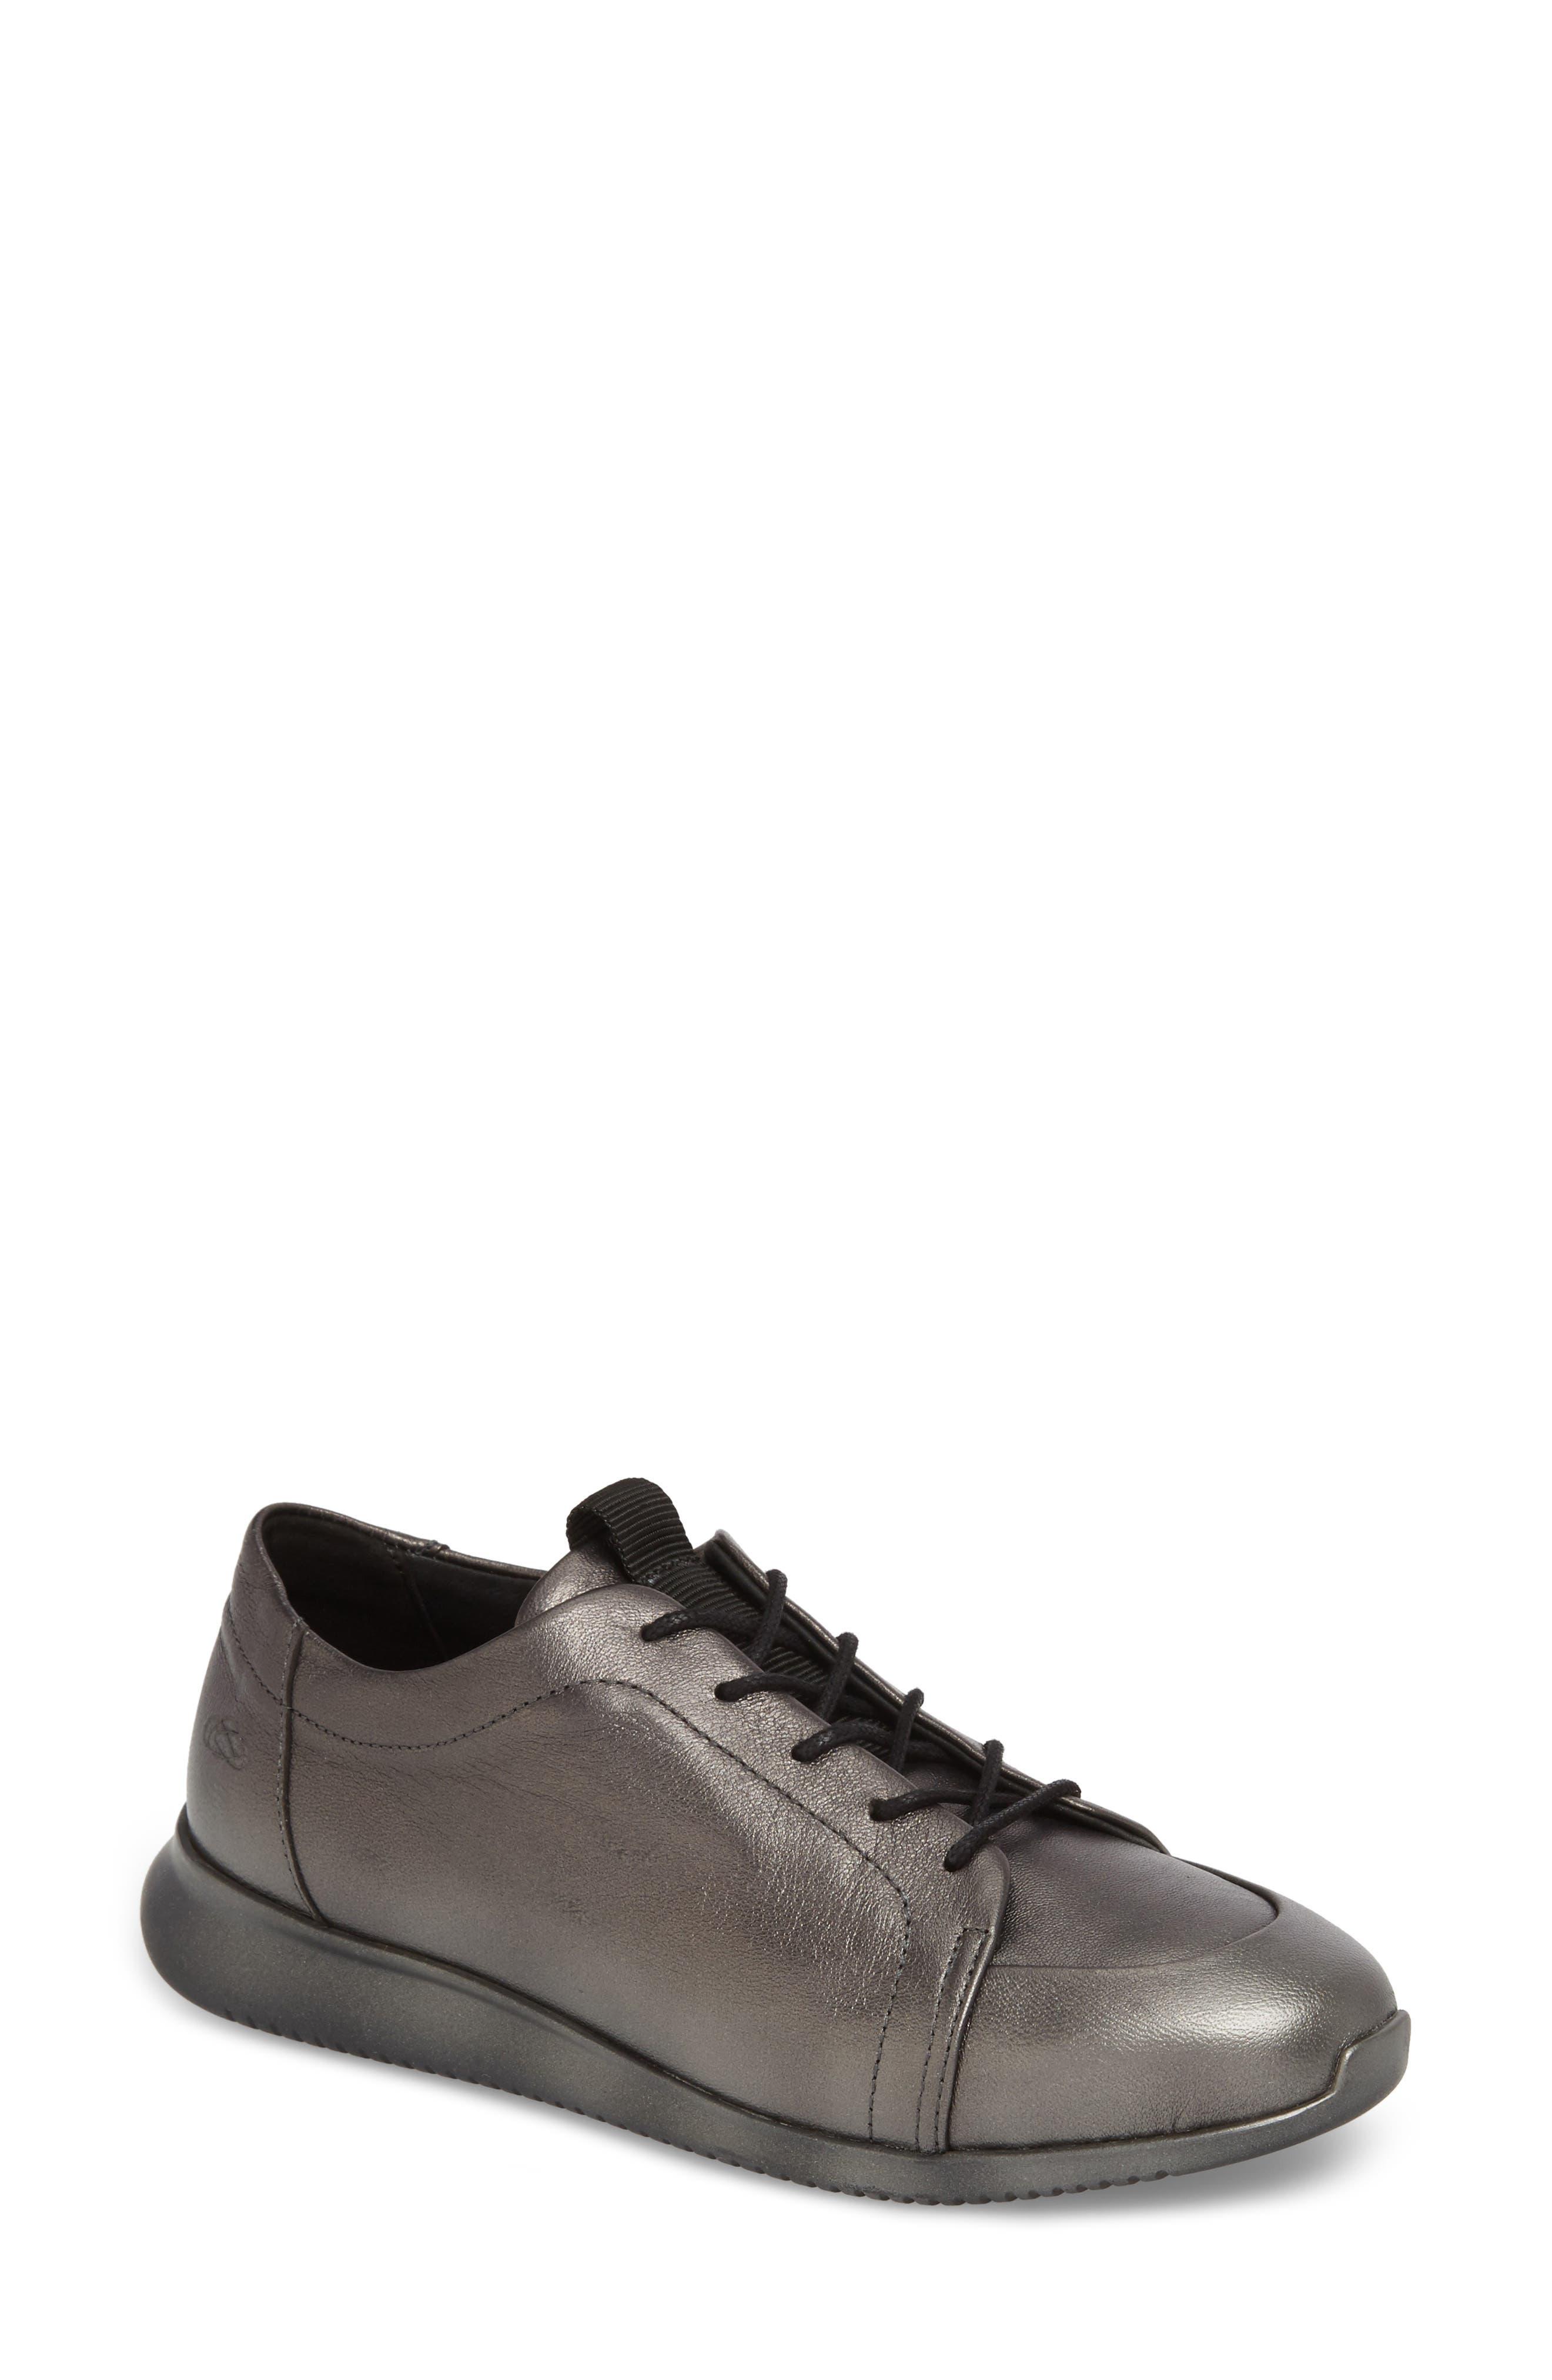 Ria Sneaker,                             Main thumbnail 1, color,